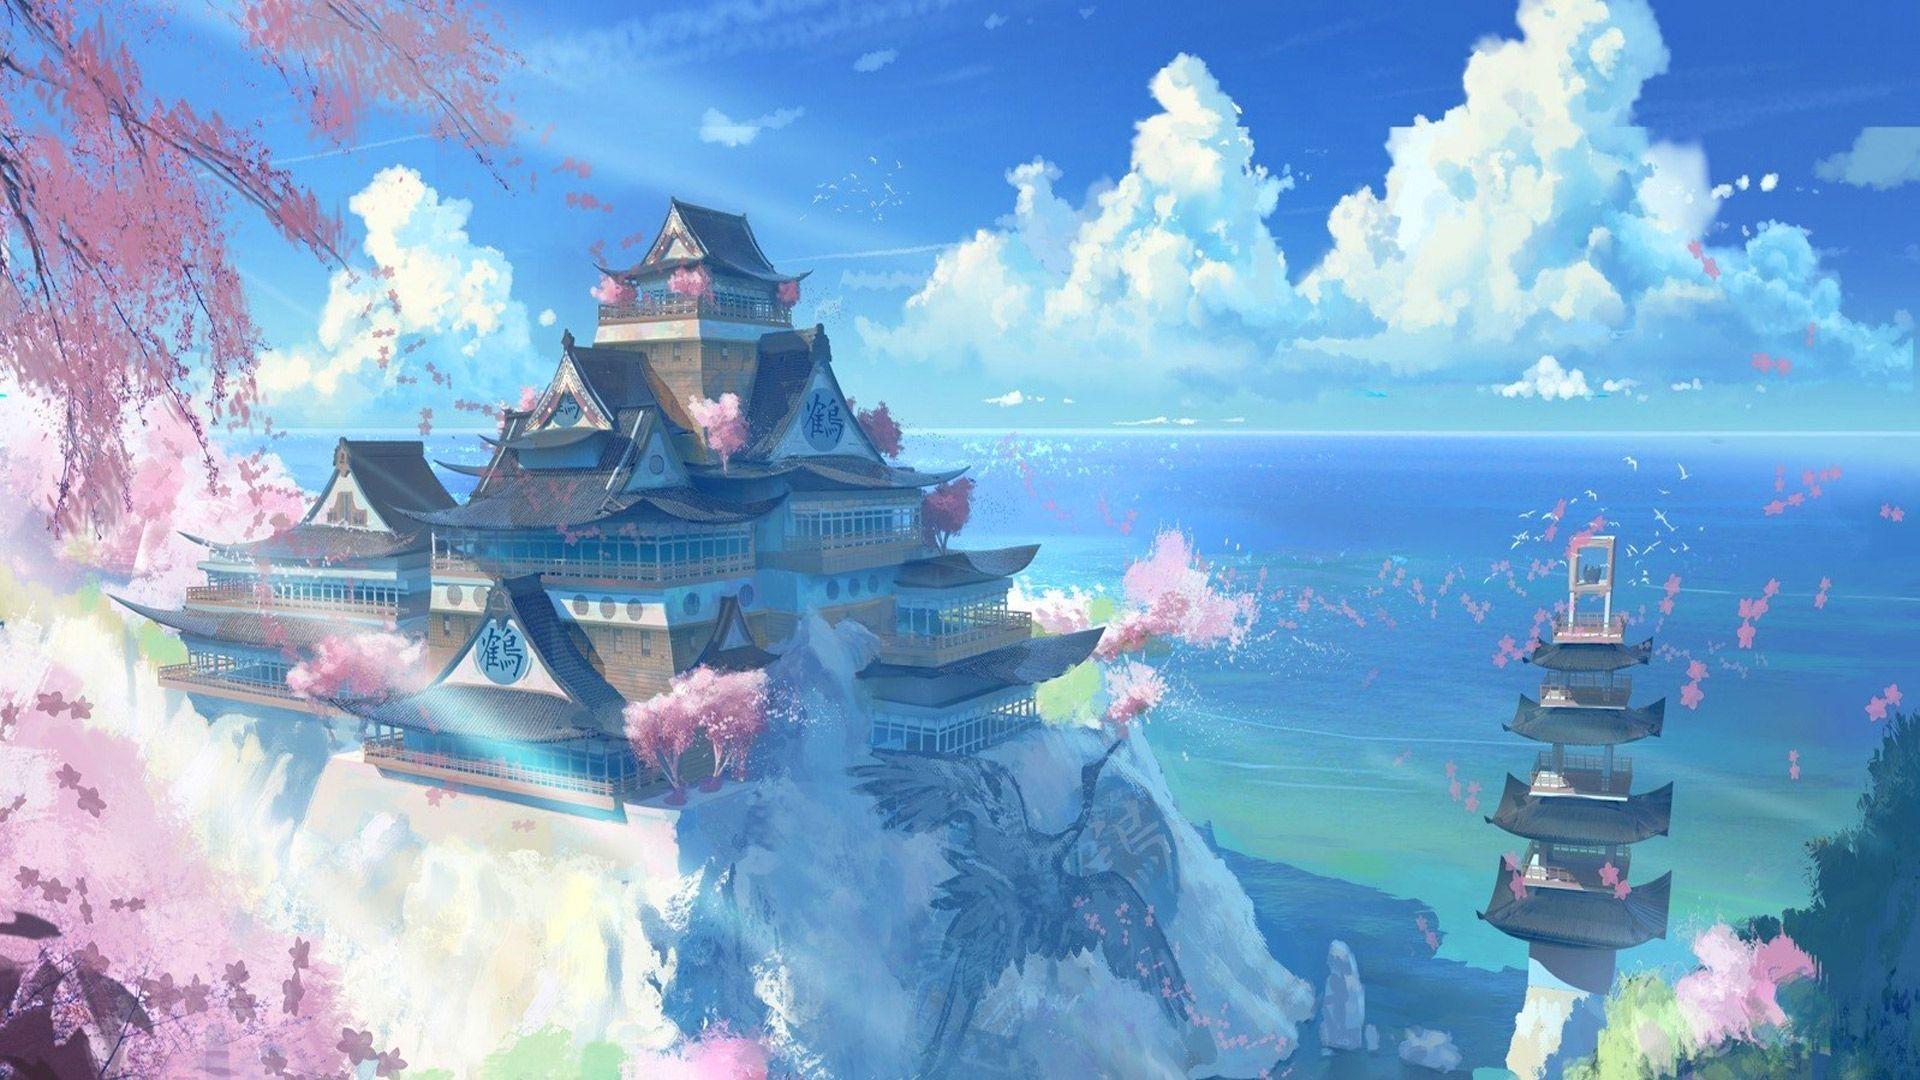 Japanese Anime Desktop Wallpapers Top Free Japanese Anime Desktop Backgrounds Wallpaperaccess